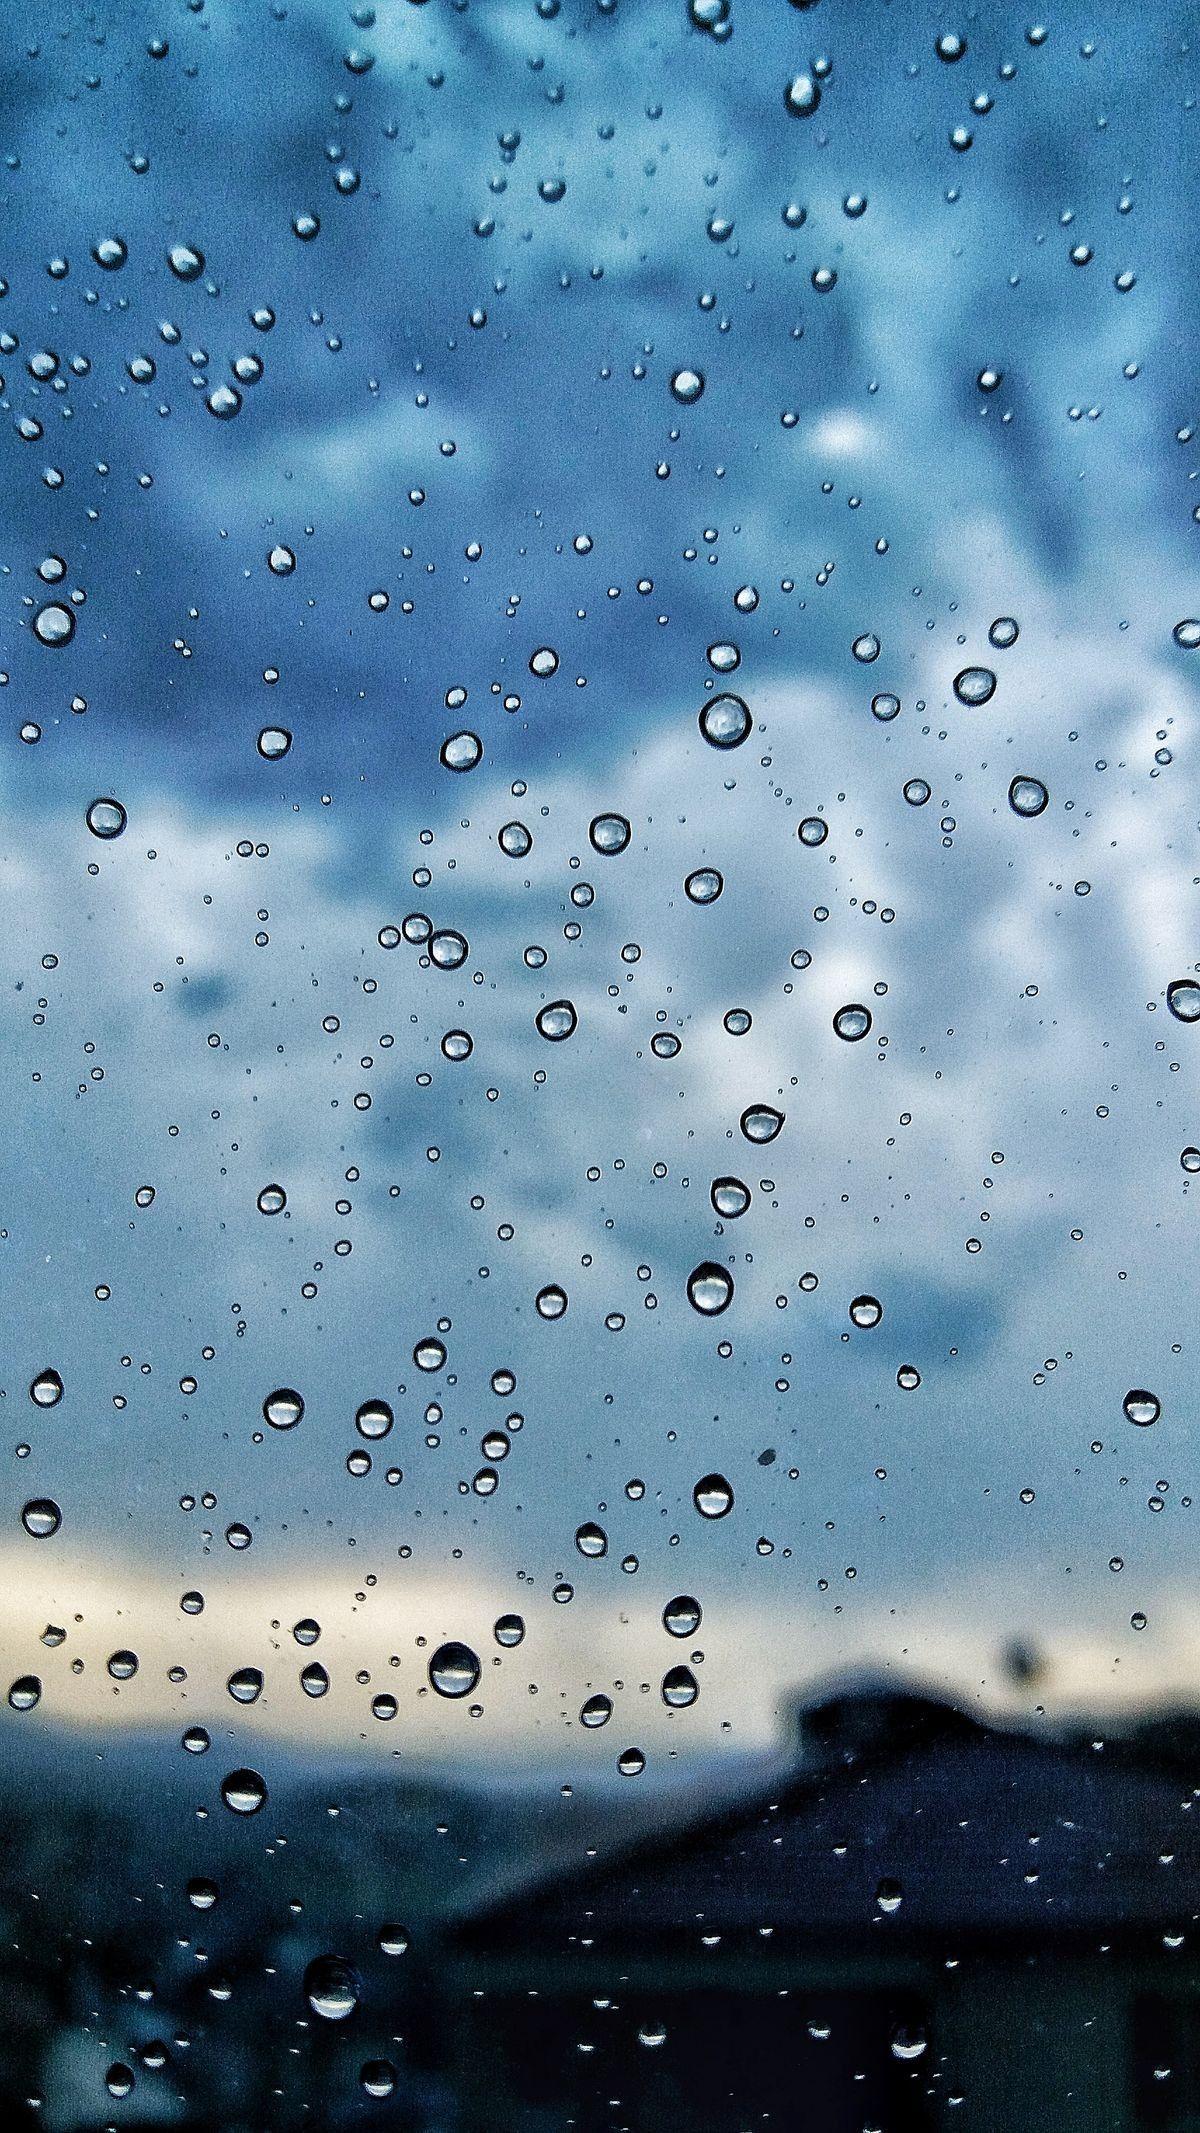 Rain Love Rainy Wallpaper Rain Wallpapers Rain Photography